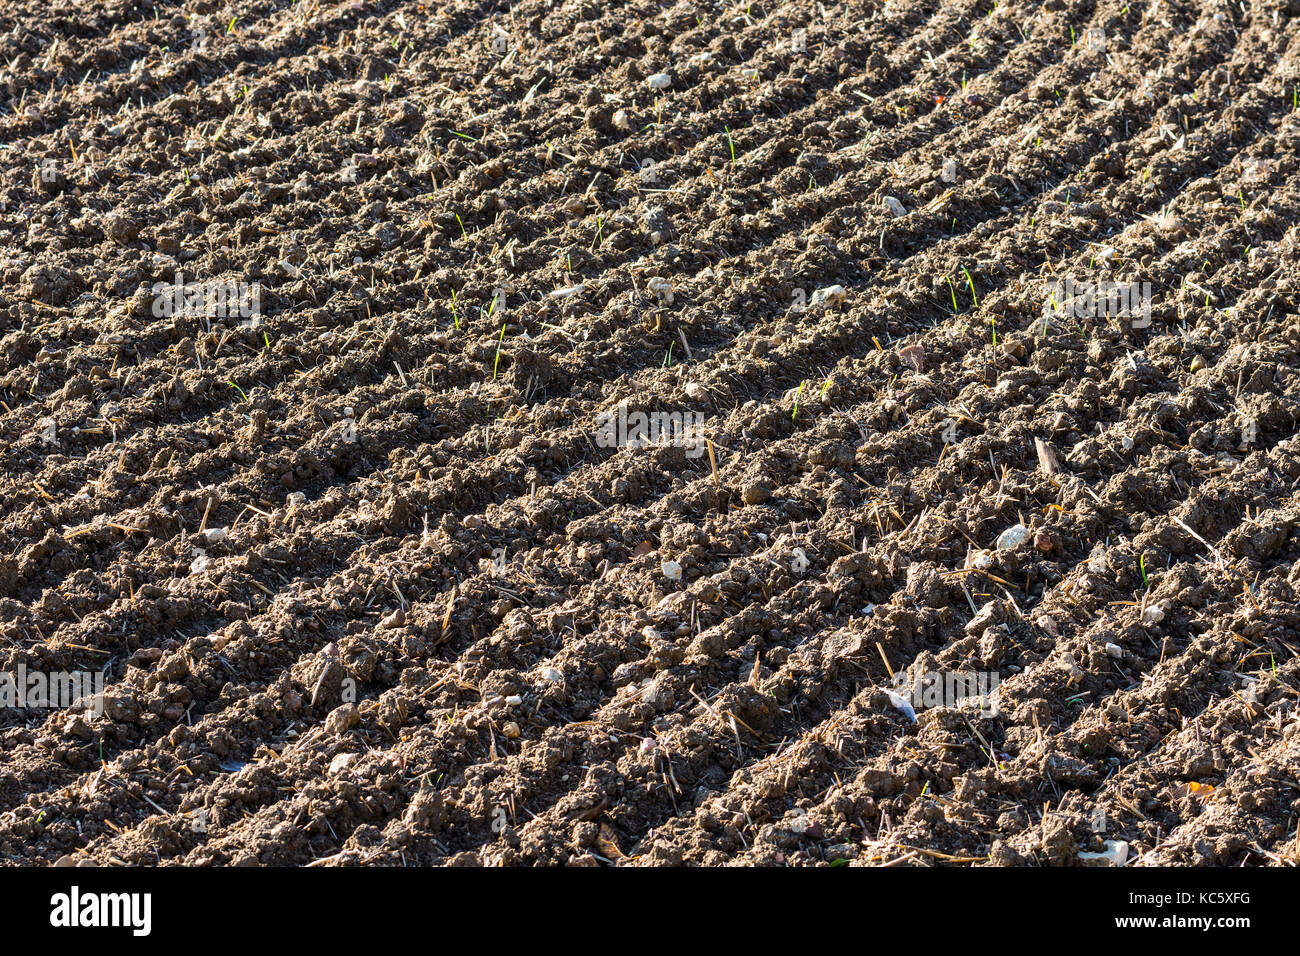 Tilled farmland, France. - Stock Image